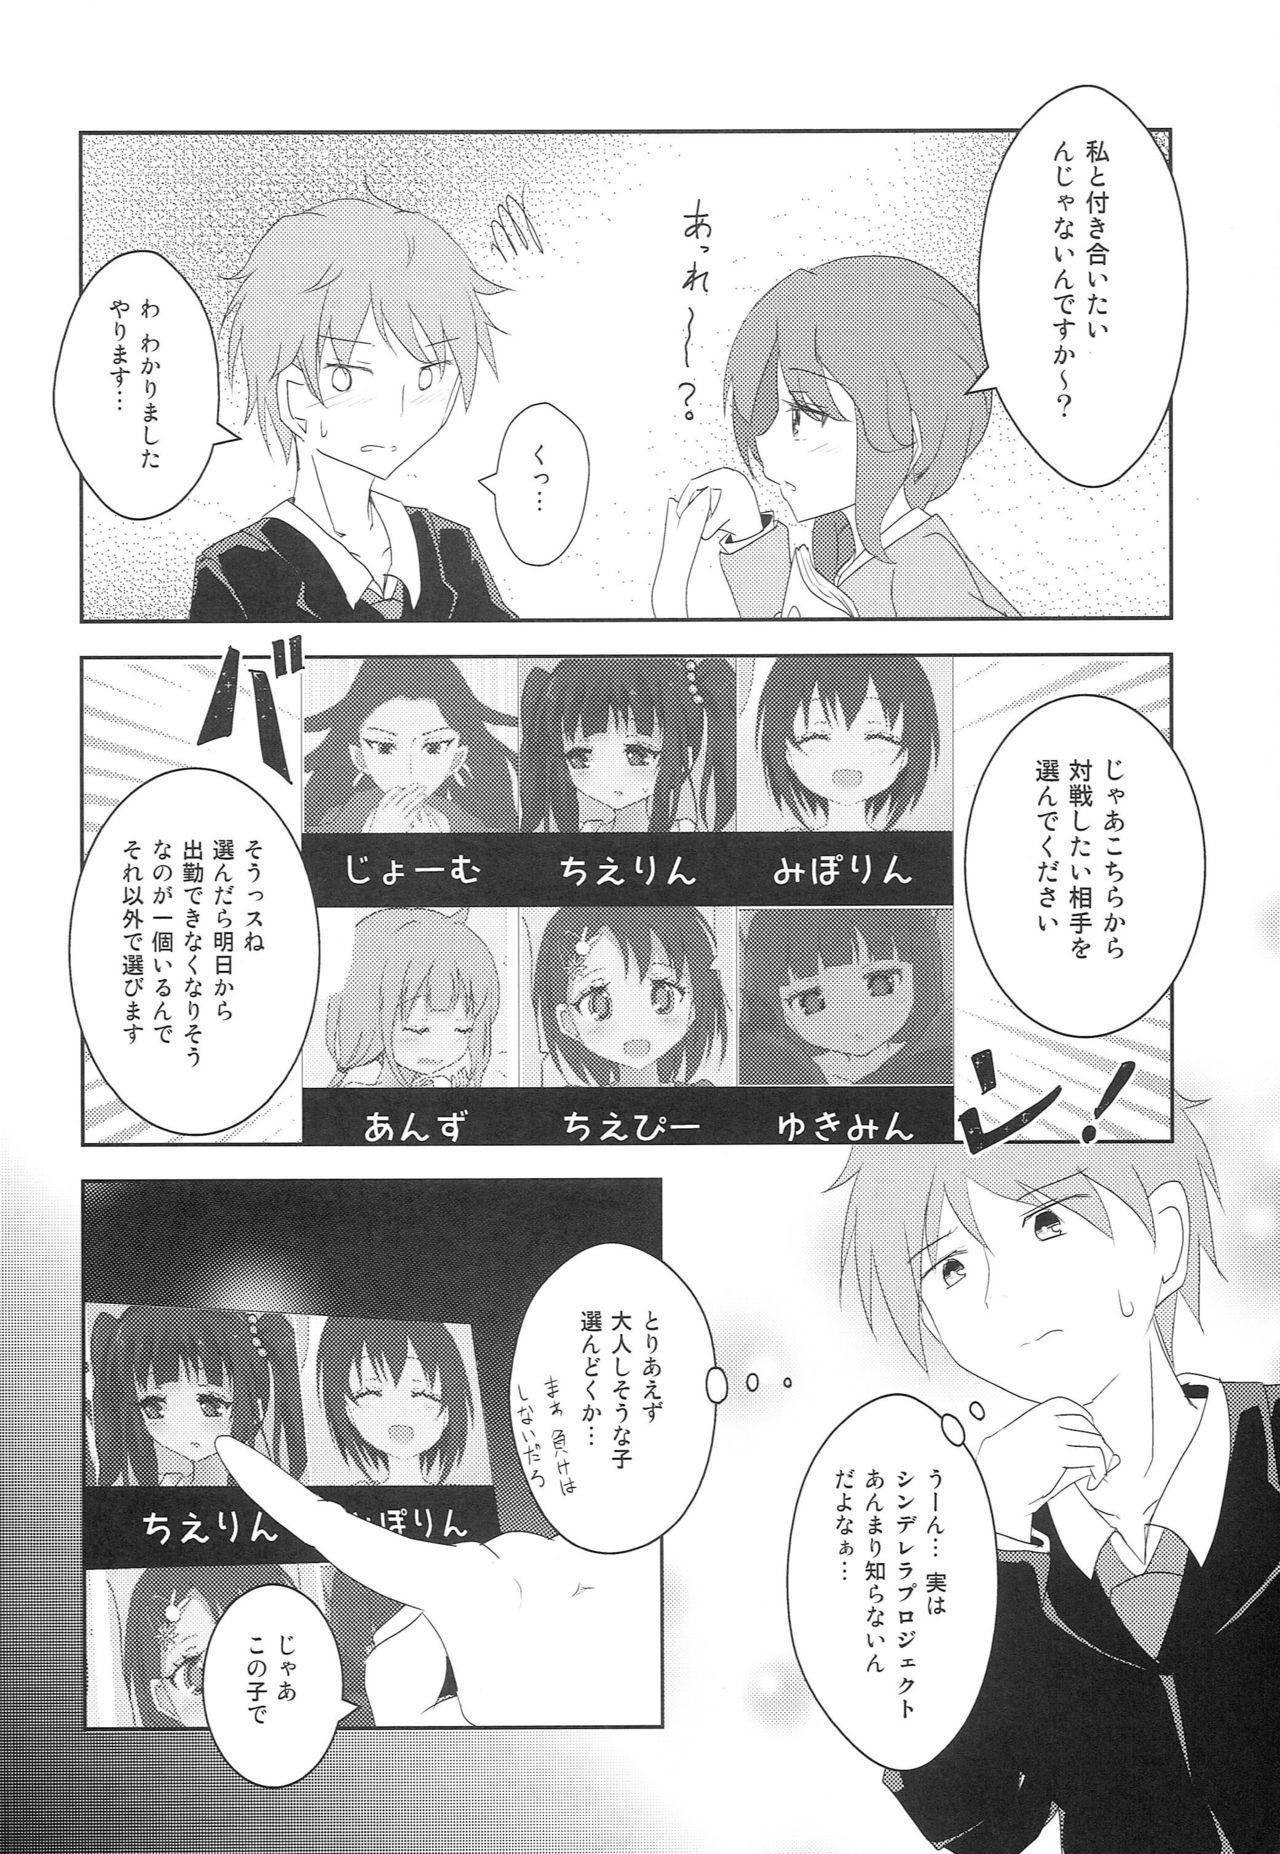 (CINDERELLA FESTIV@L) [Ribbon Enikki+ (Mickeysmith)] Chihiro-san ni Kokuhaku Shitara, Idol-tachi ni Mawasaretanda ga. (THE IDOLM@STER CINDERELLA GIRLS) 4